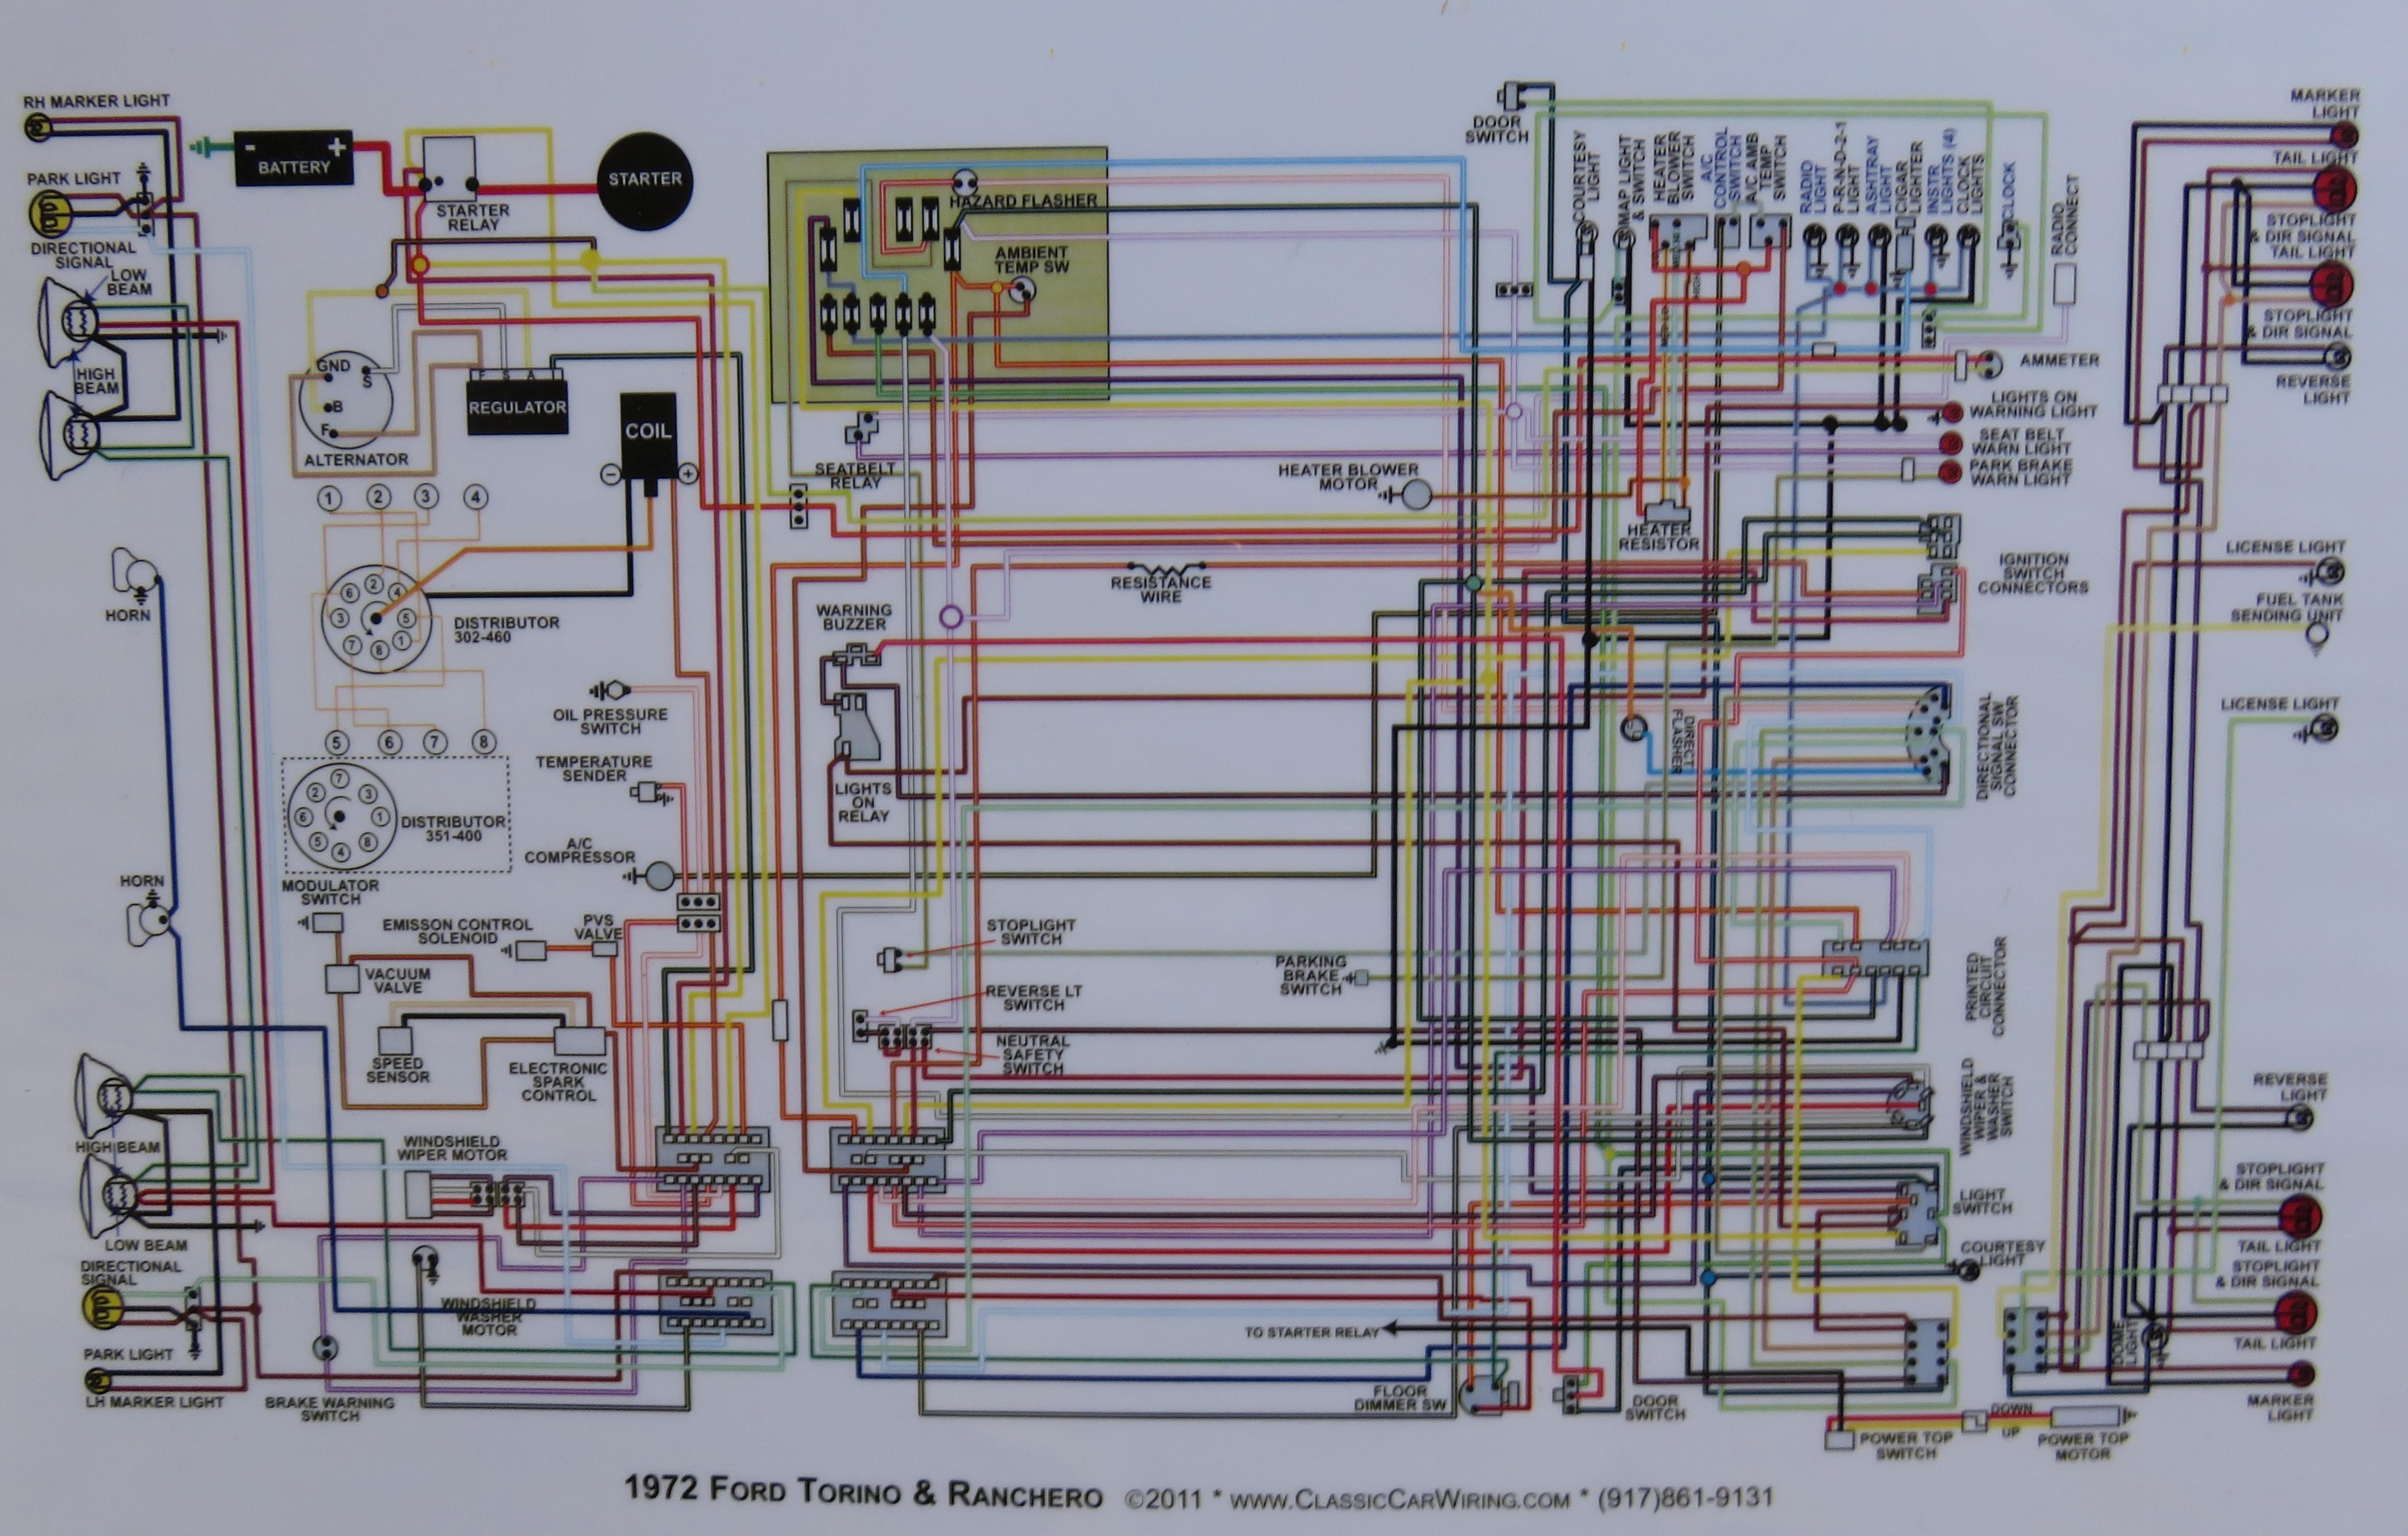 au ford falcon wiring diagram free download wiring library rh 83 skriptoase de 63 ford falcon wiring diagrams 66 ford falcon wiring diagrams [ 4564 x 2912 Pixel ]